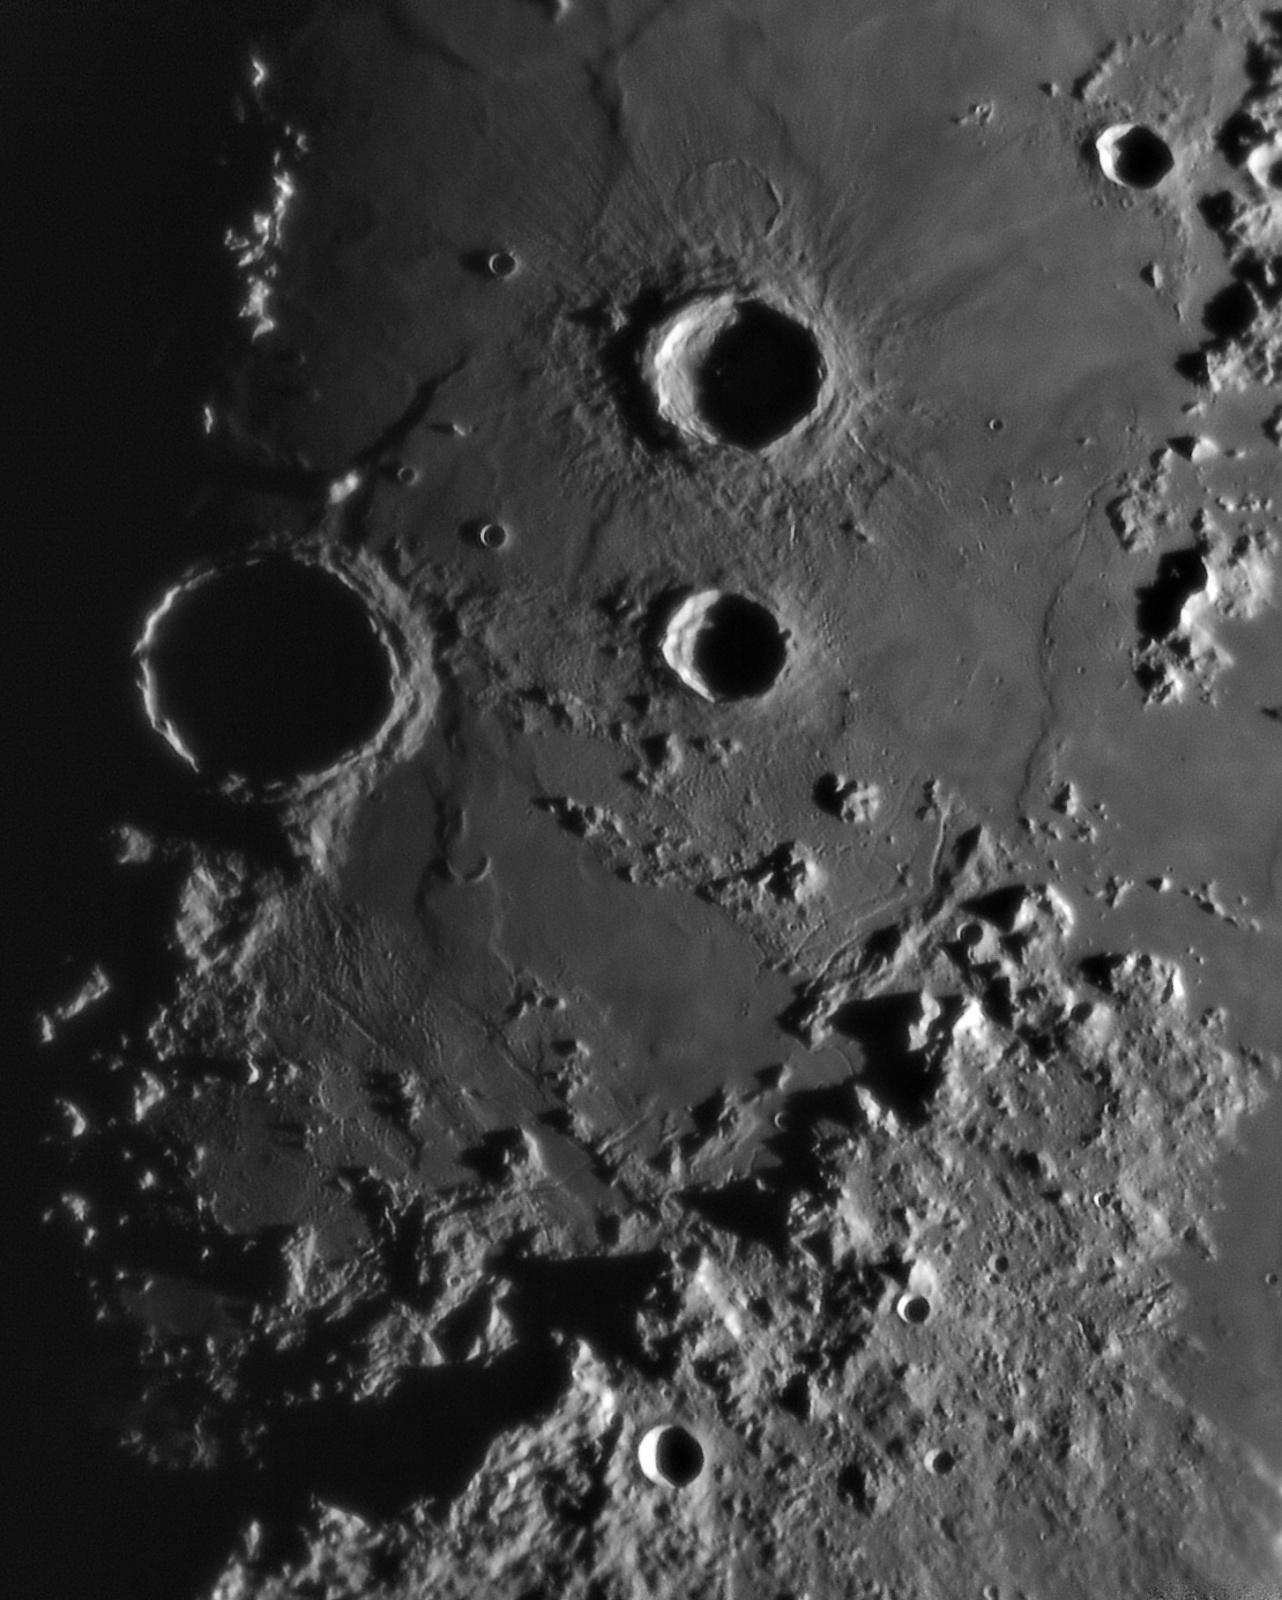 Moon 20191204_193802_g4_ap598_conv pop.jpg